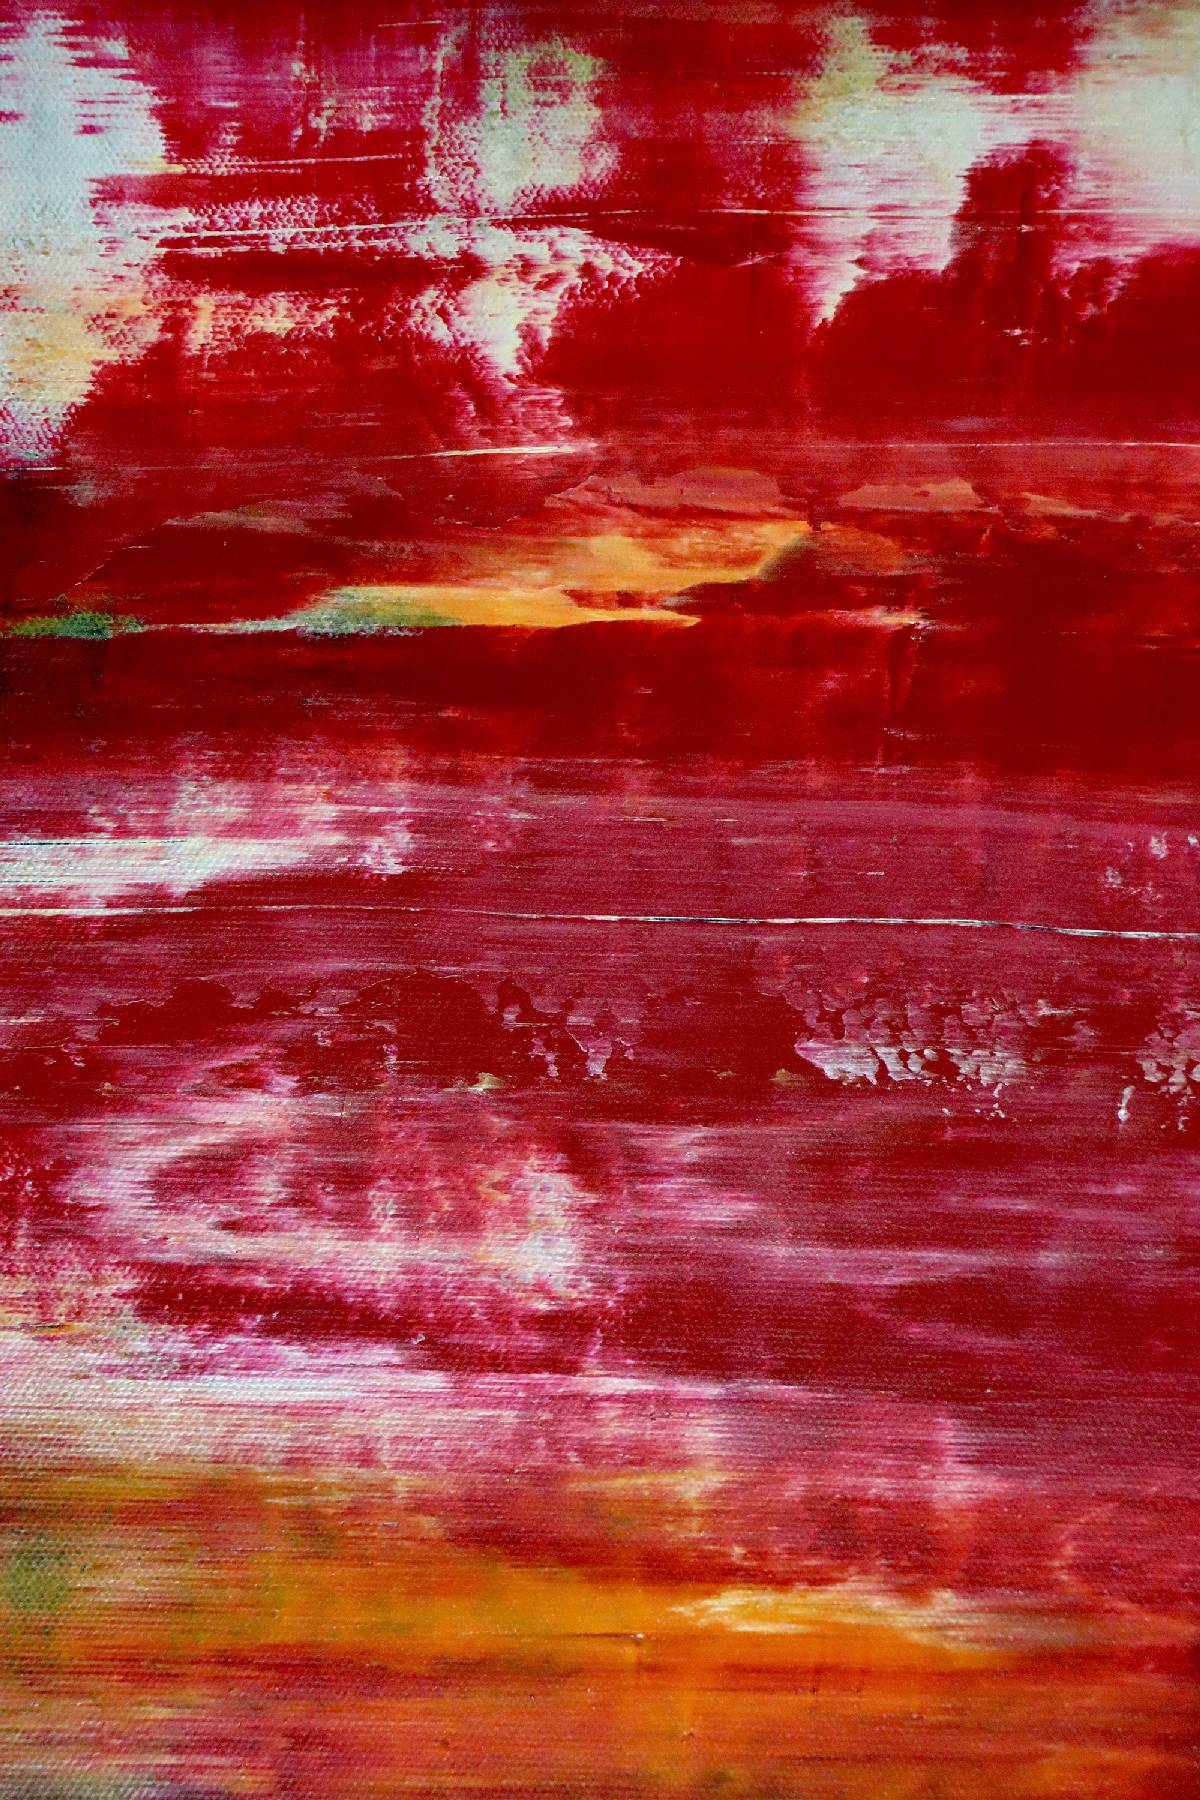 SOLD - Summer Window View 2 (2020) by Nestor Toro